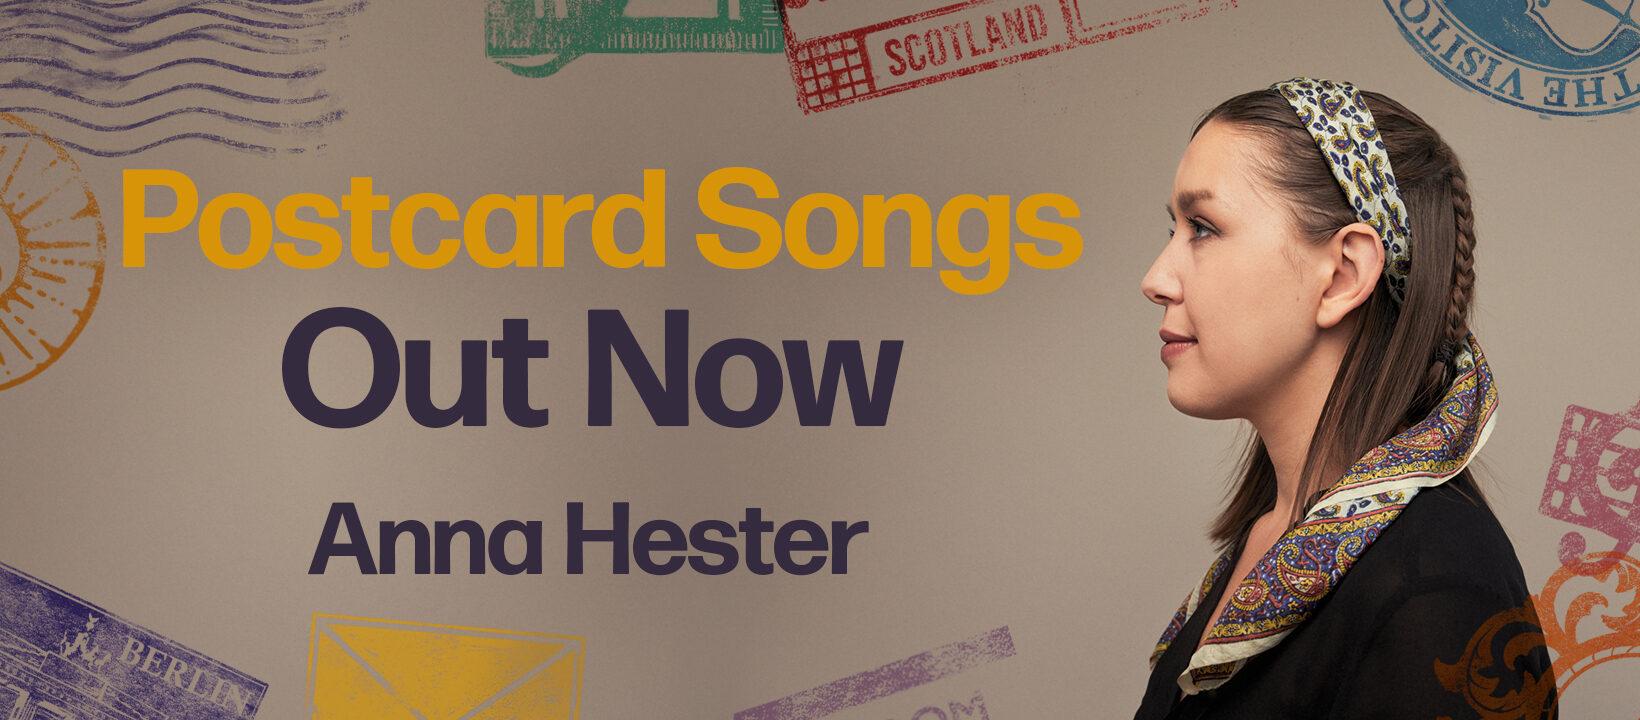 Anna Hester